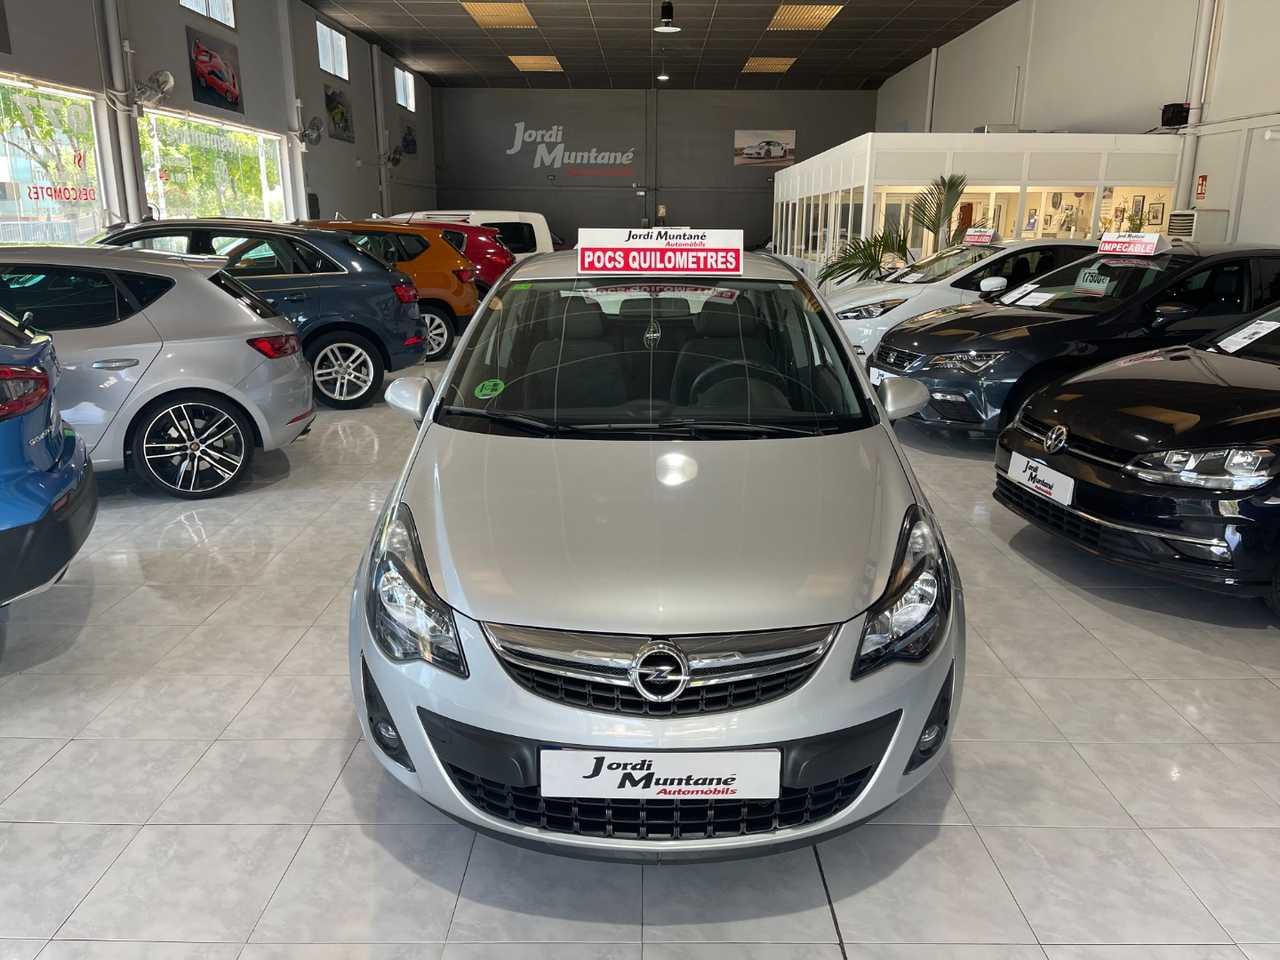 Opel Corsa 1.4I 100CV.- 5 PUERTAS.-